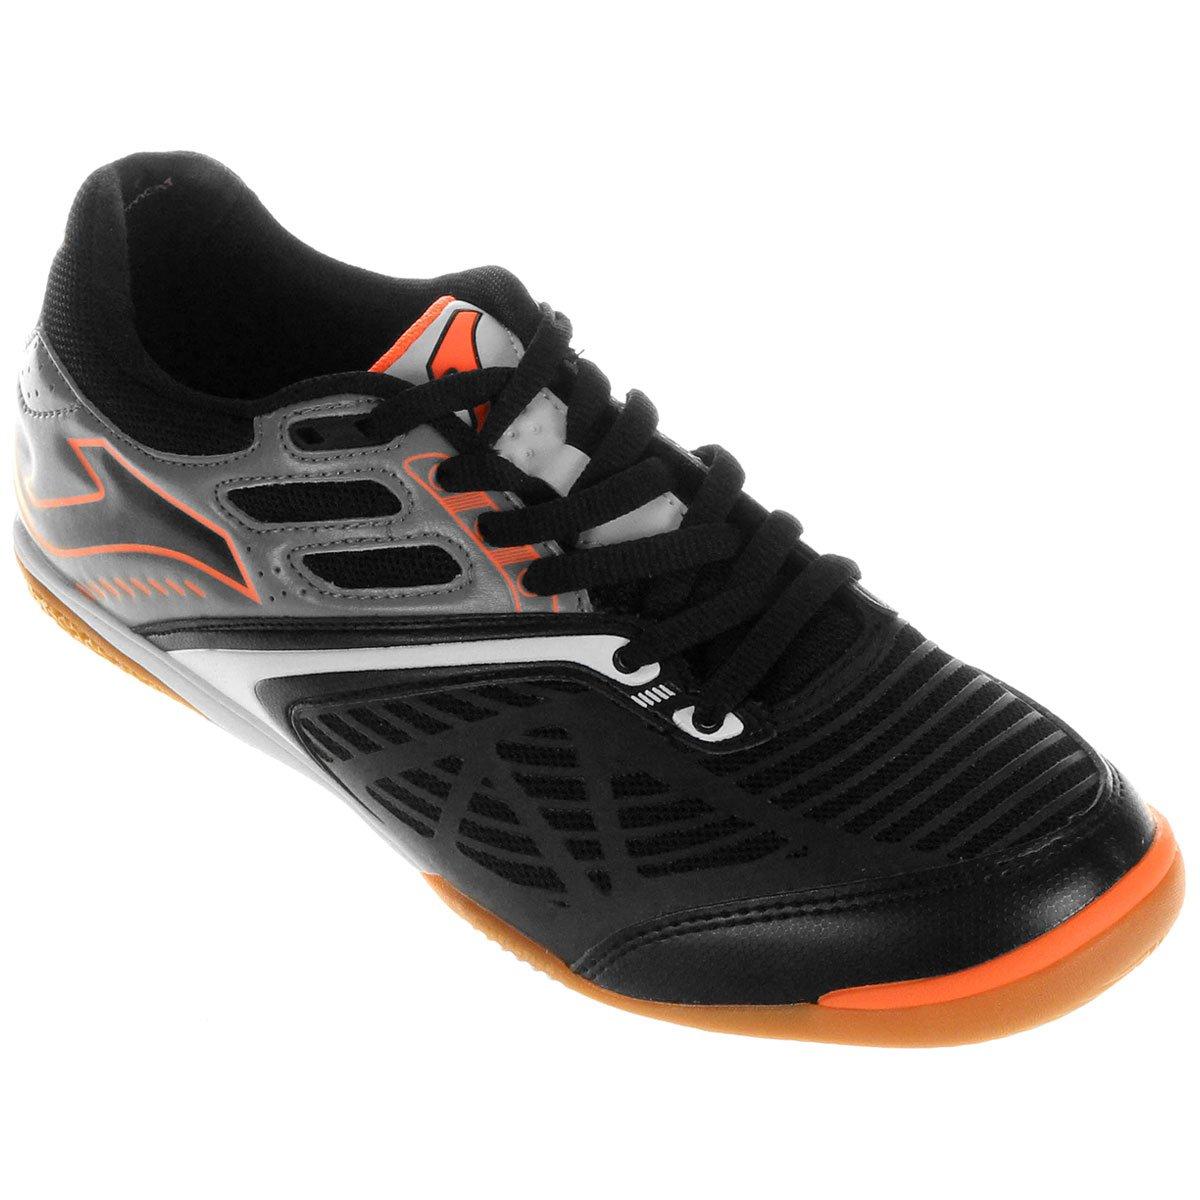 Chuteira Joma Lozano Futsal - Compre Agora  ef2e183a05949